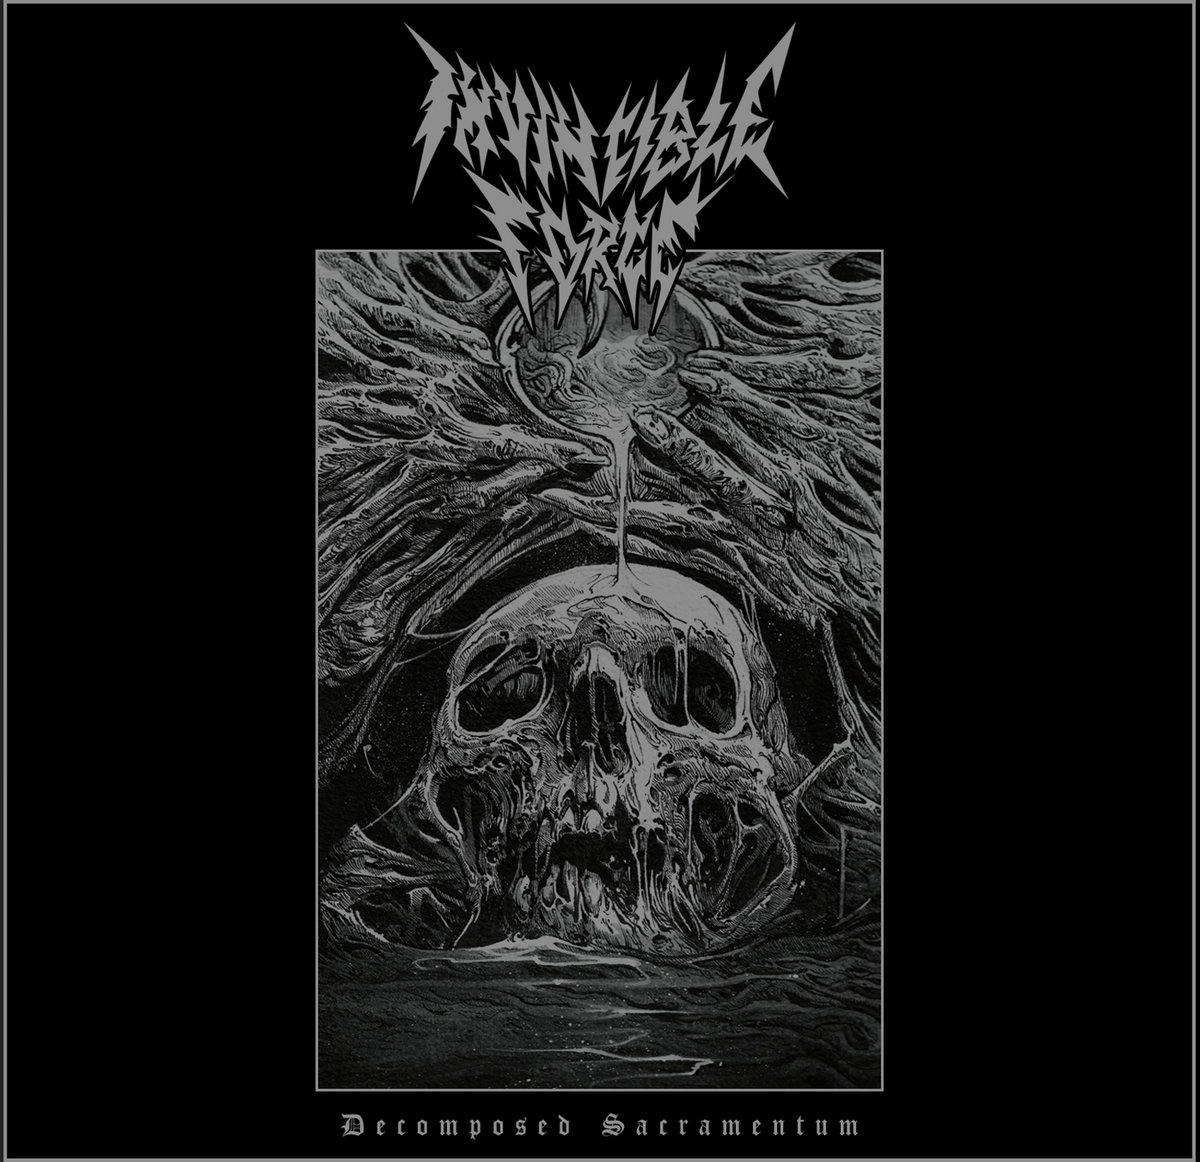 INVINCIBLE FORCE decomposed sacramentum cover artwork